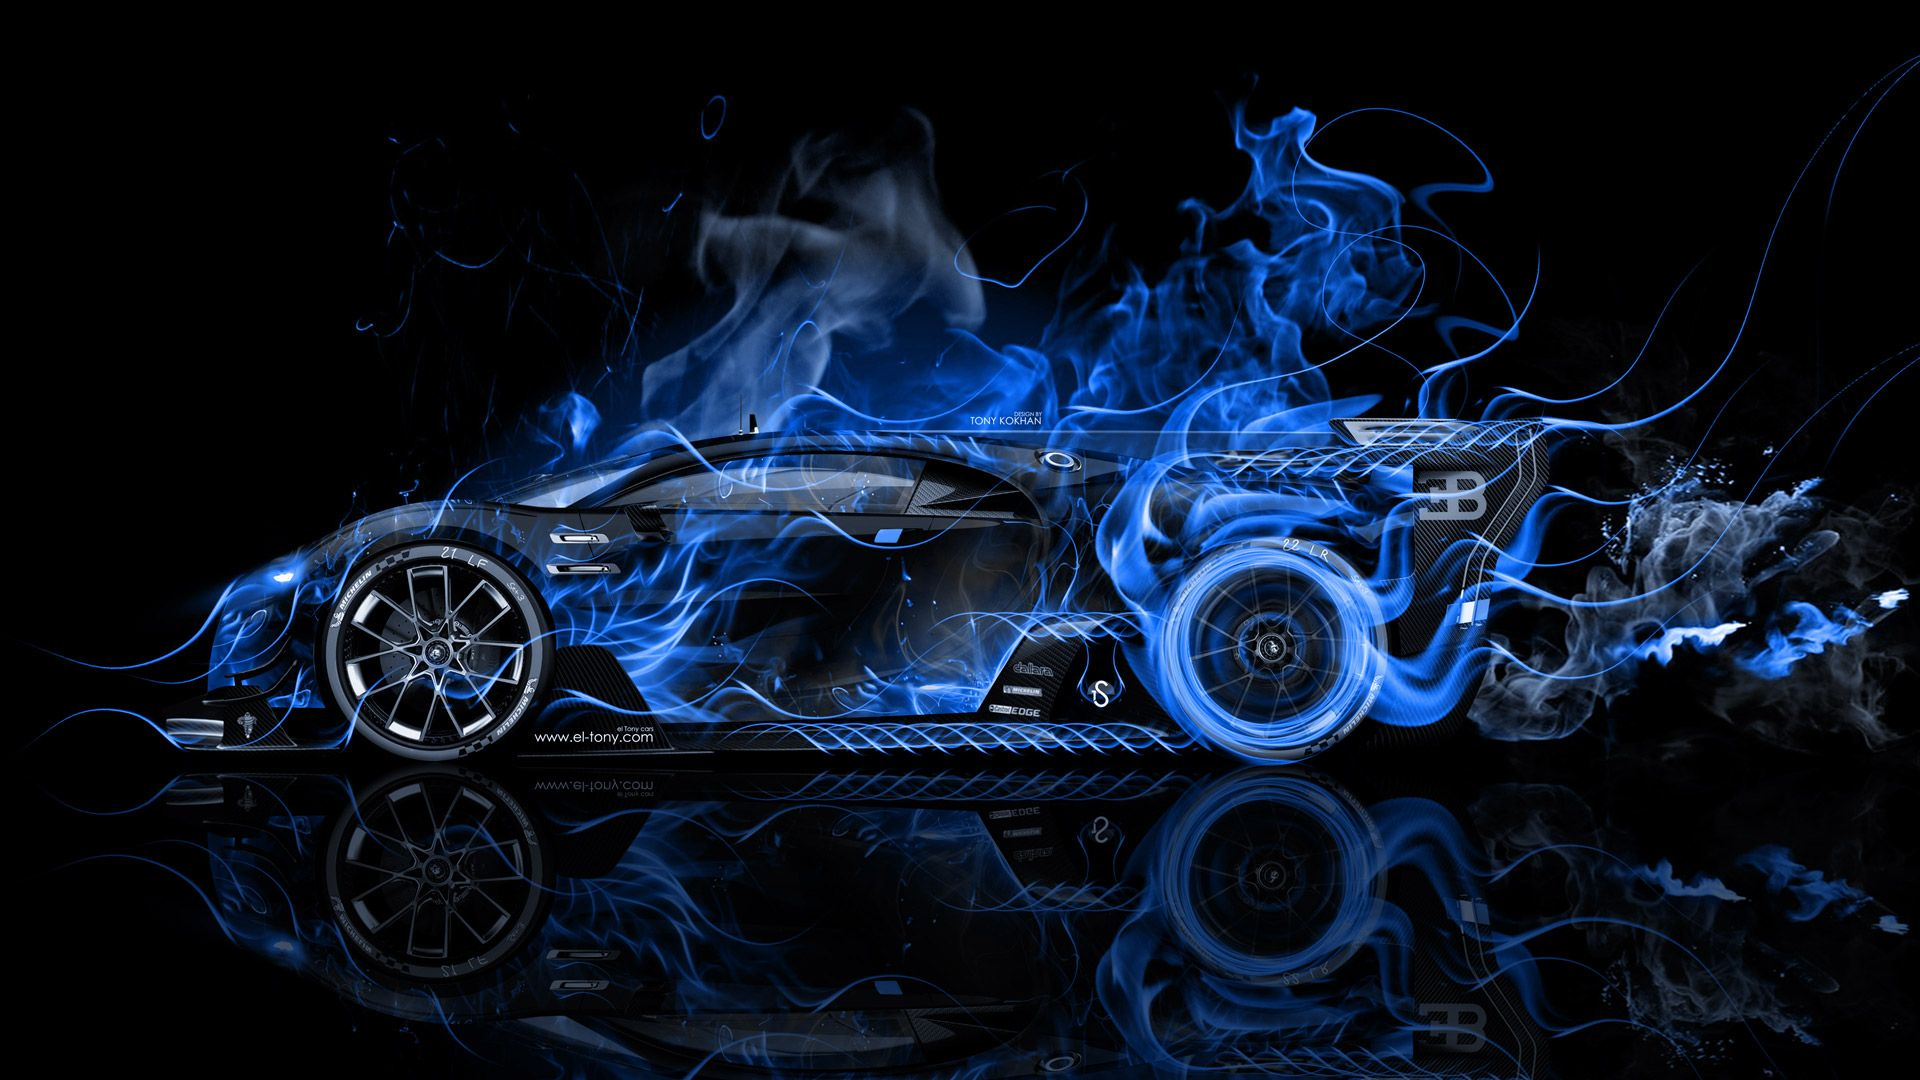 Merveilleux Bugatti Vision Gran Turismo Side Super Fire Flame